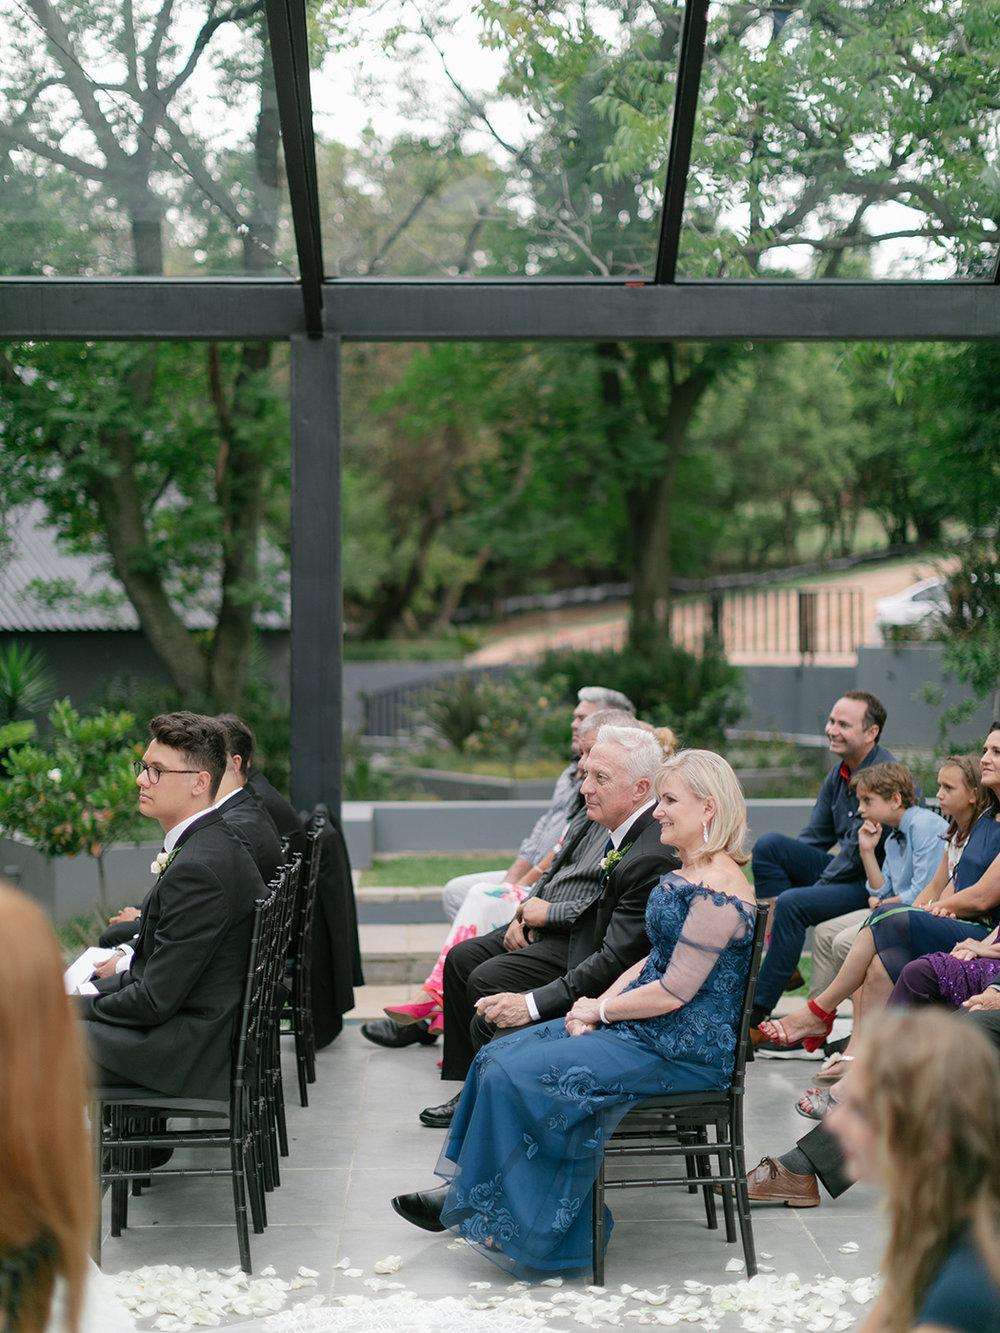 Ceremony | Rensche Mari Photography